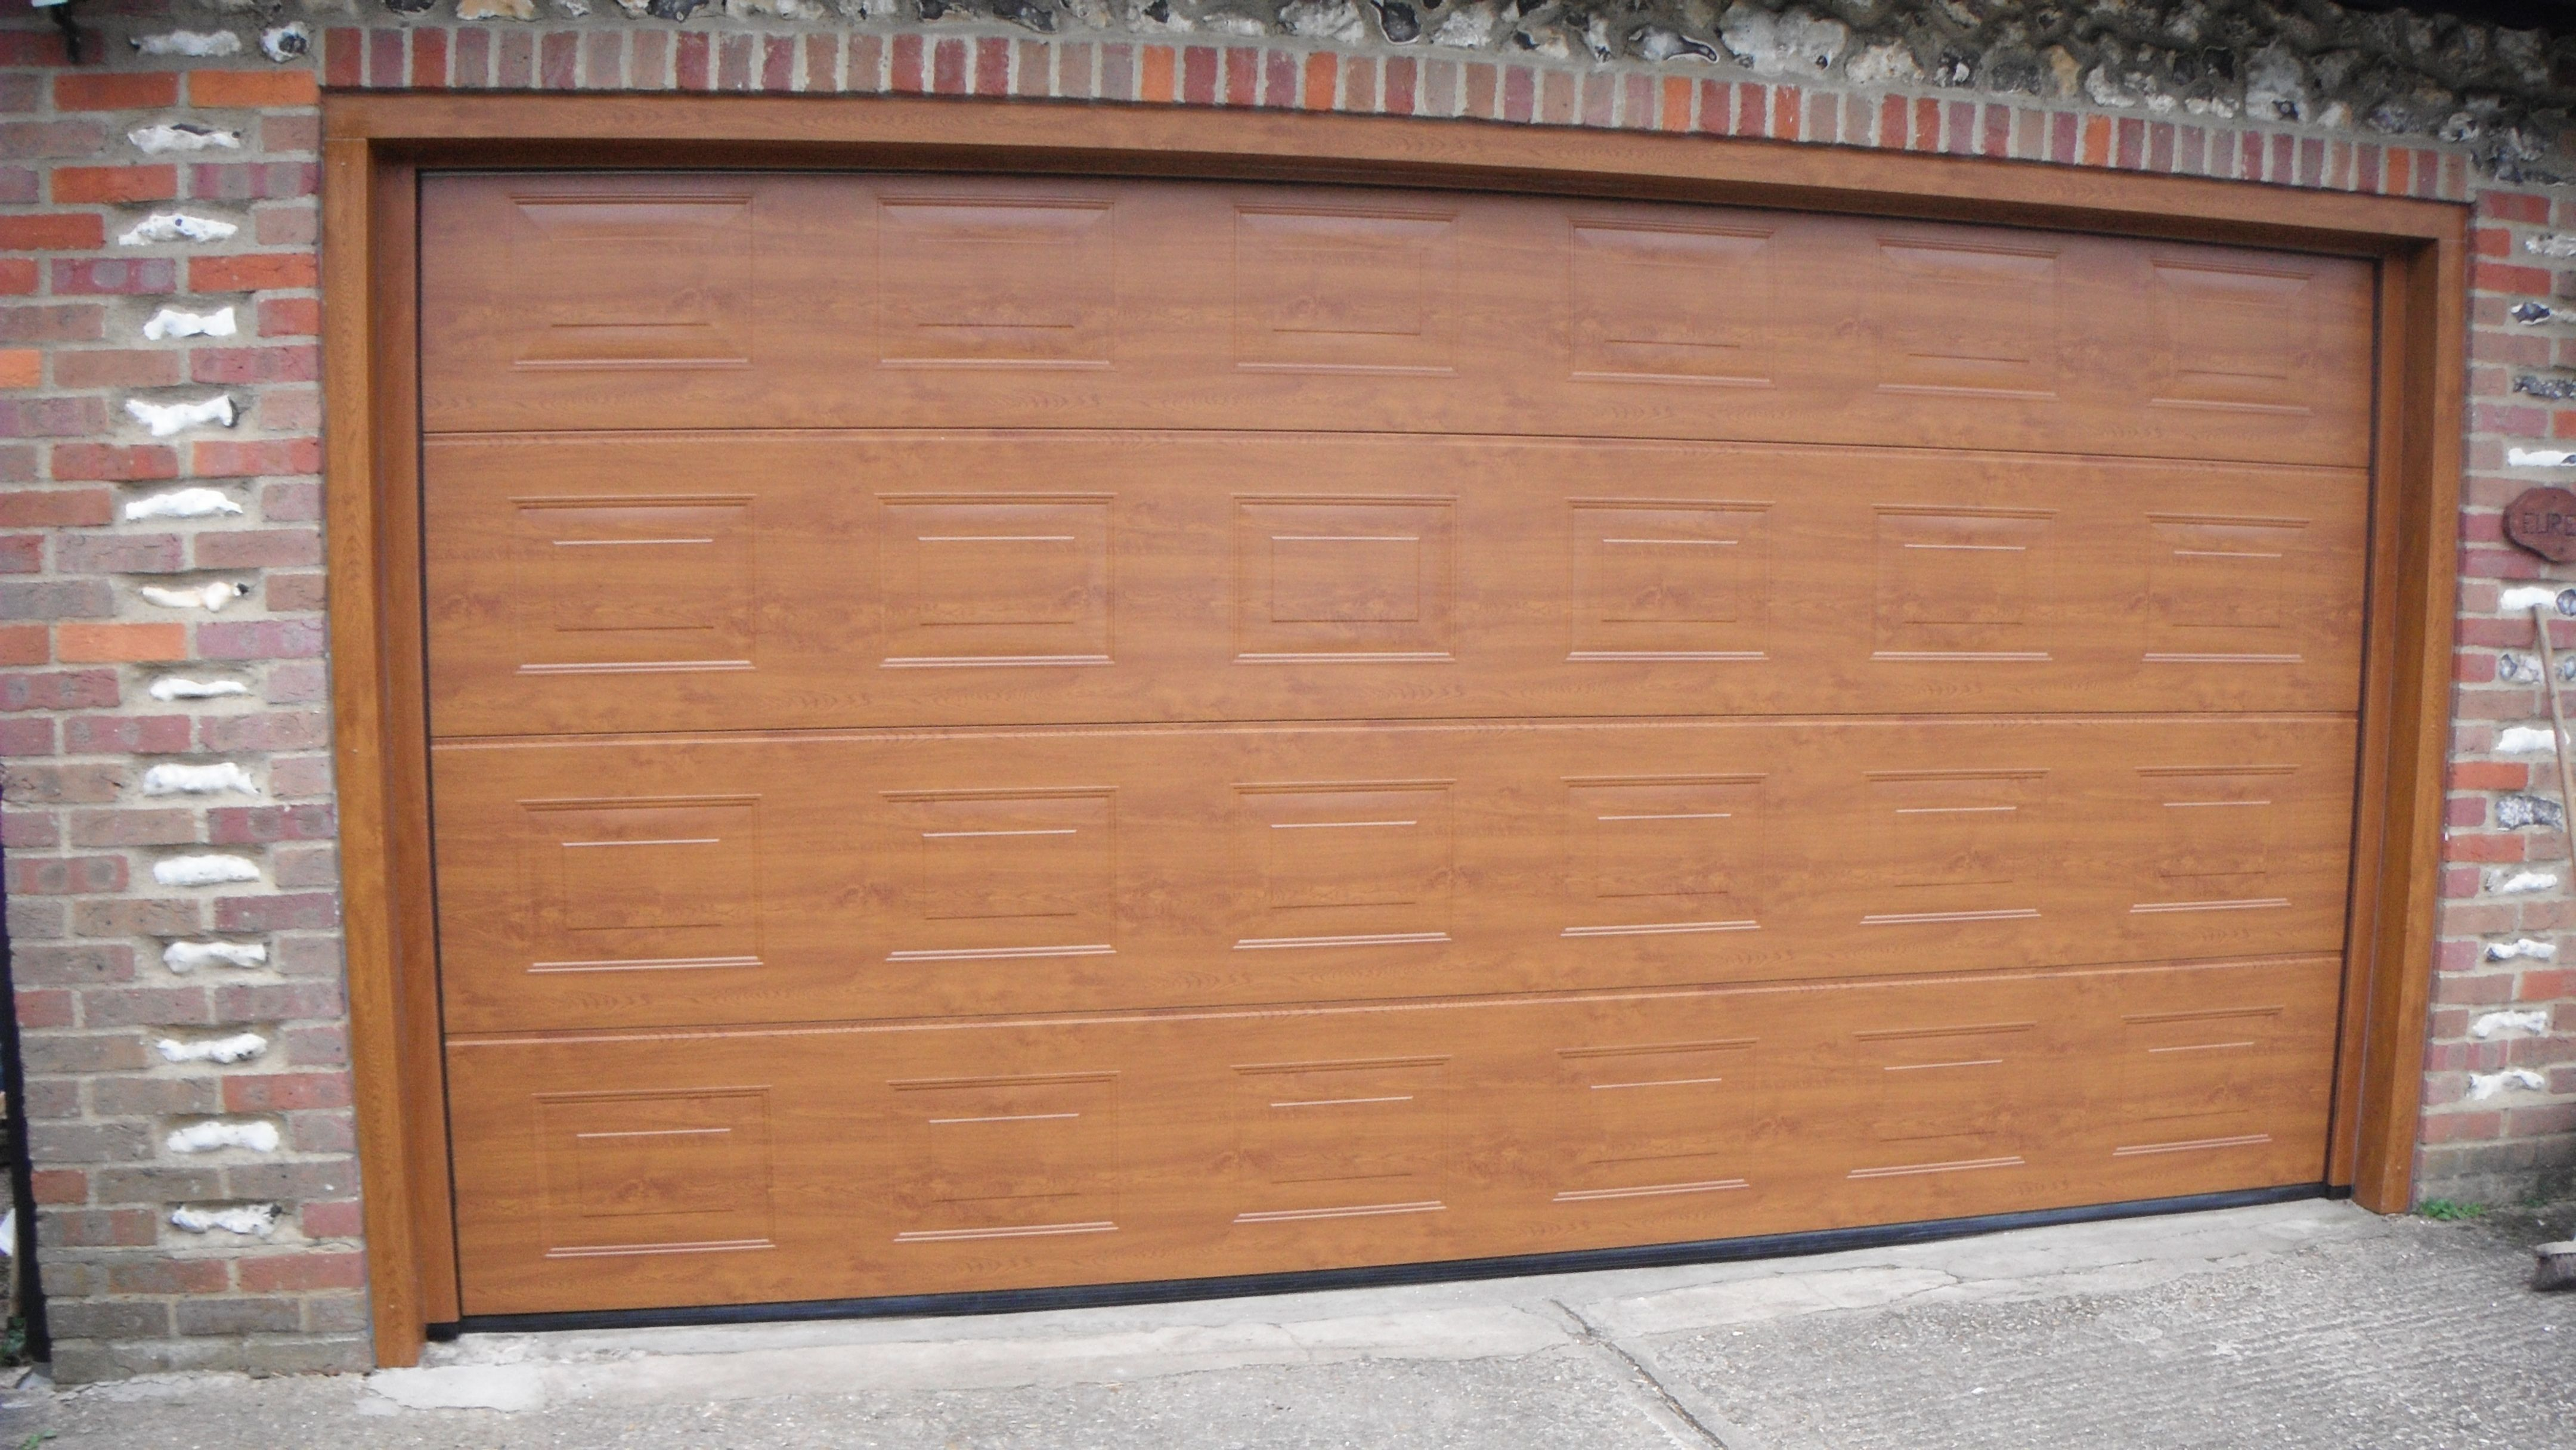 Hormann golden oak s panelled decograin sectional garage door hormann golden oak s panelled decograin sectional garage door rubansaba